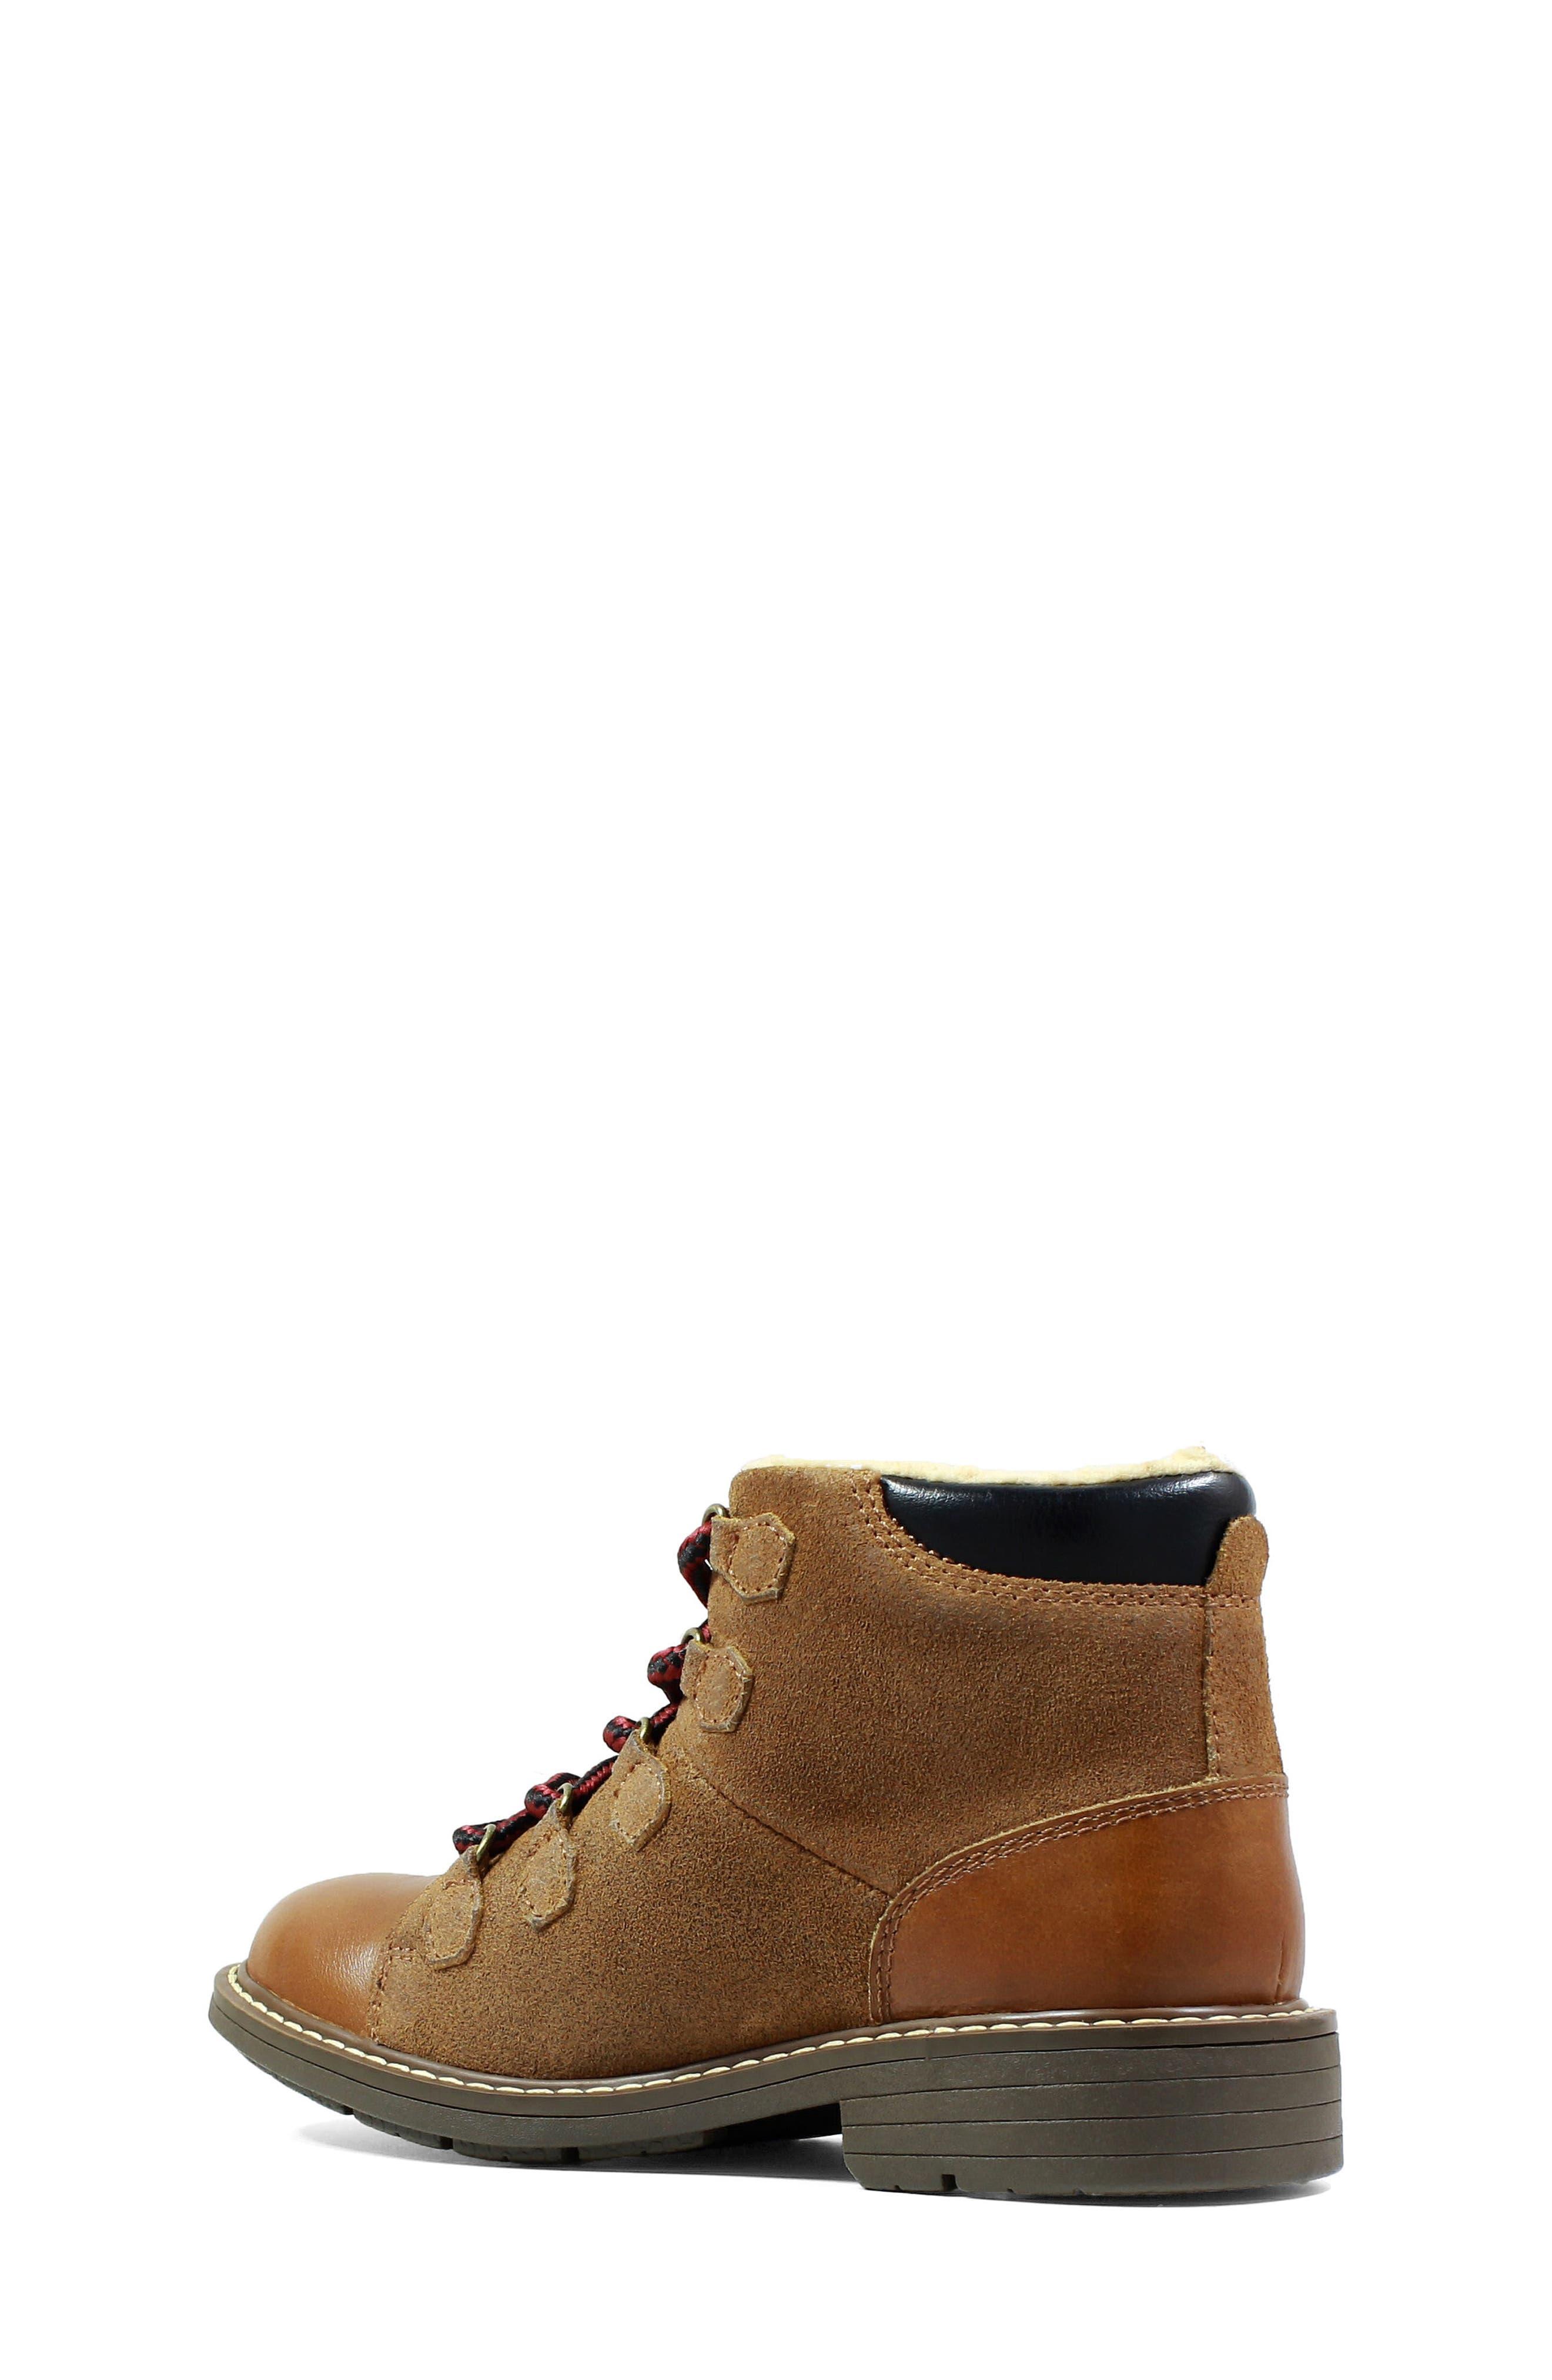 Studio Alpine Plush Lined Boot,                             Alternate thumbnail 2, color,                             Cognac